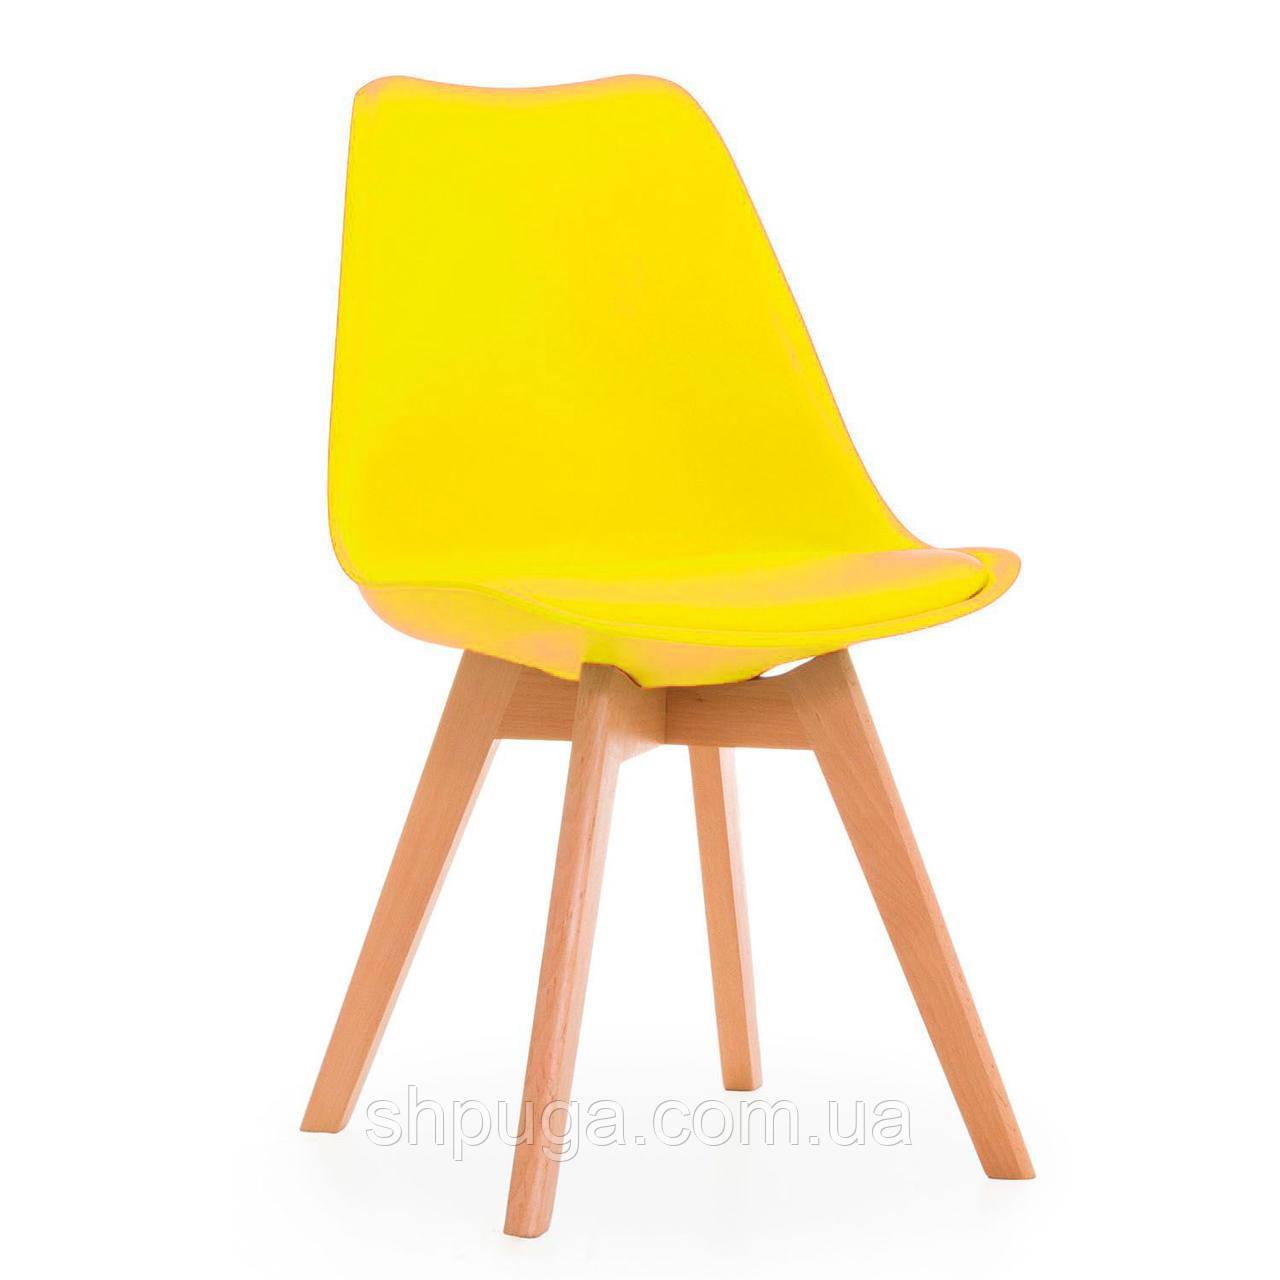 Стул Тор, пластик, ножки буковые, цвет желтый